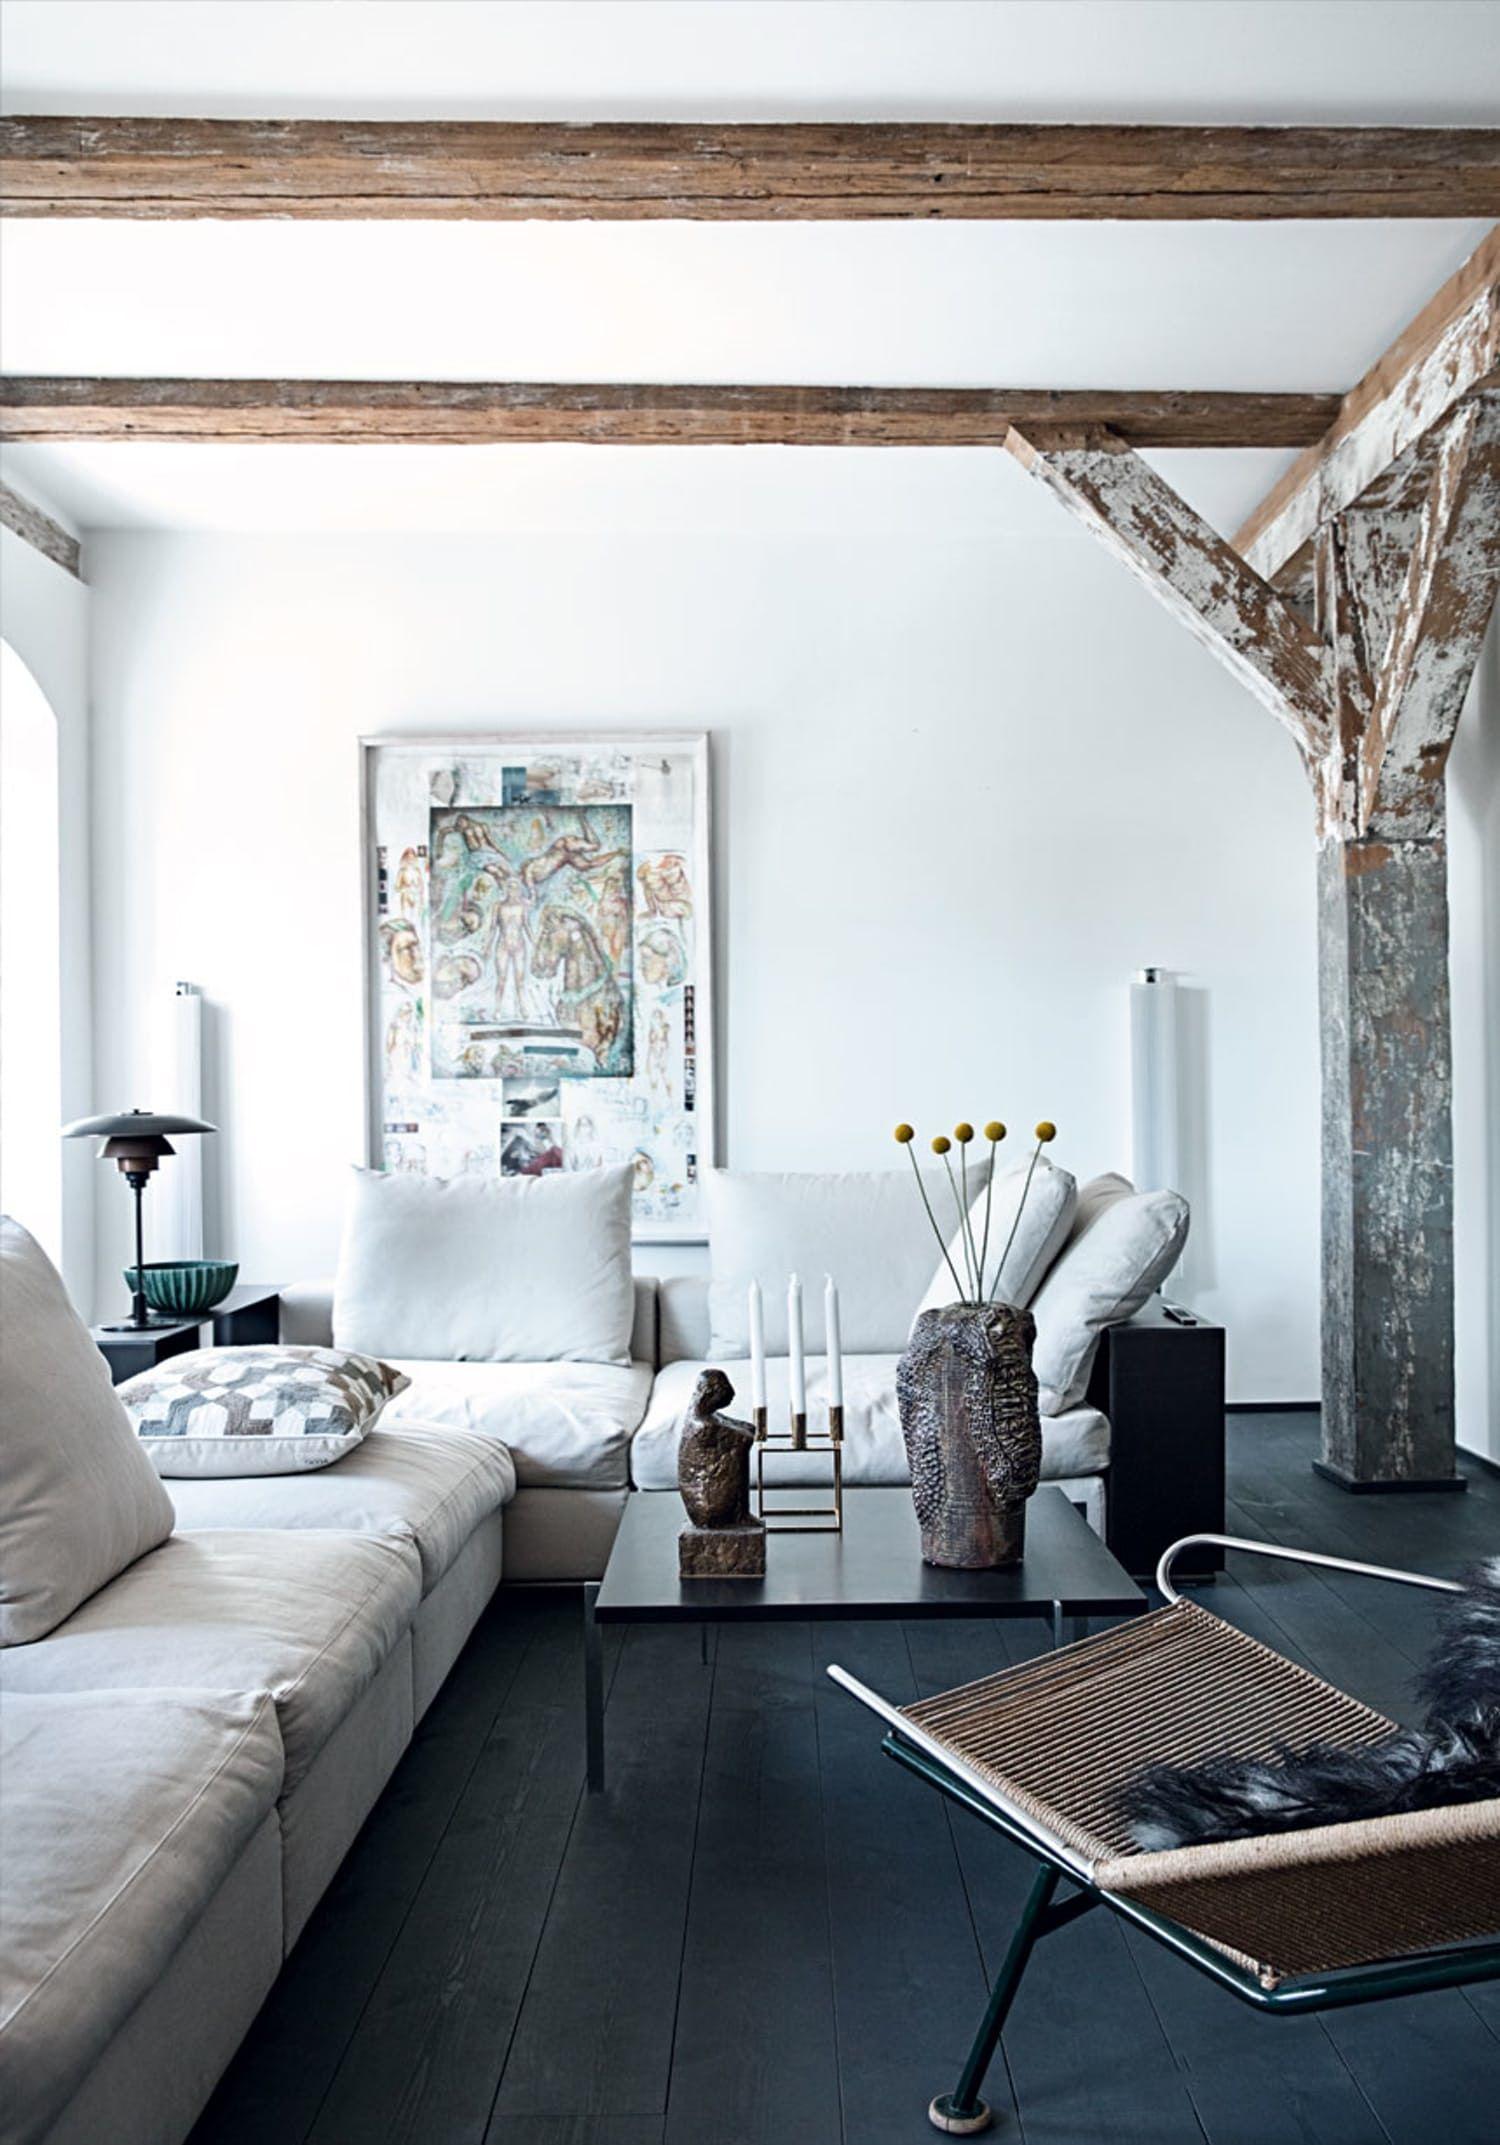 Moderne Flexform-sofa i dagligstuen | t O w n h O u s e◻️t O ...